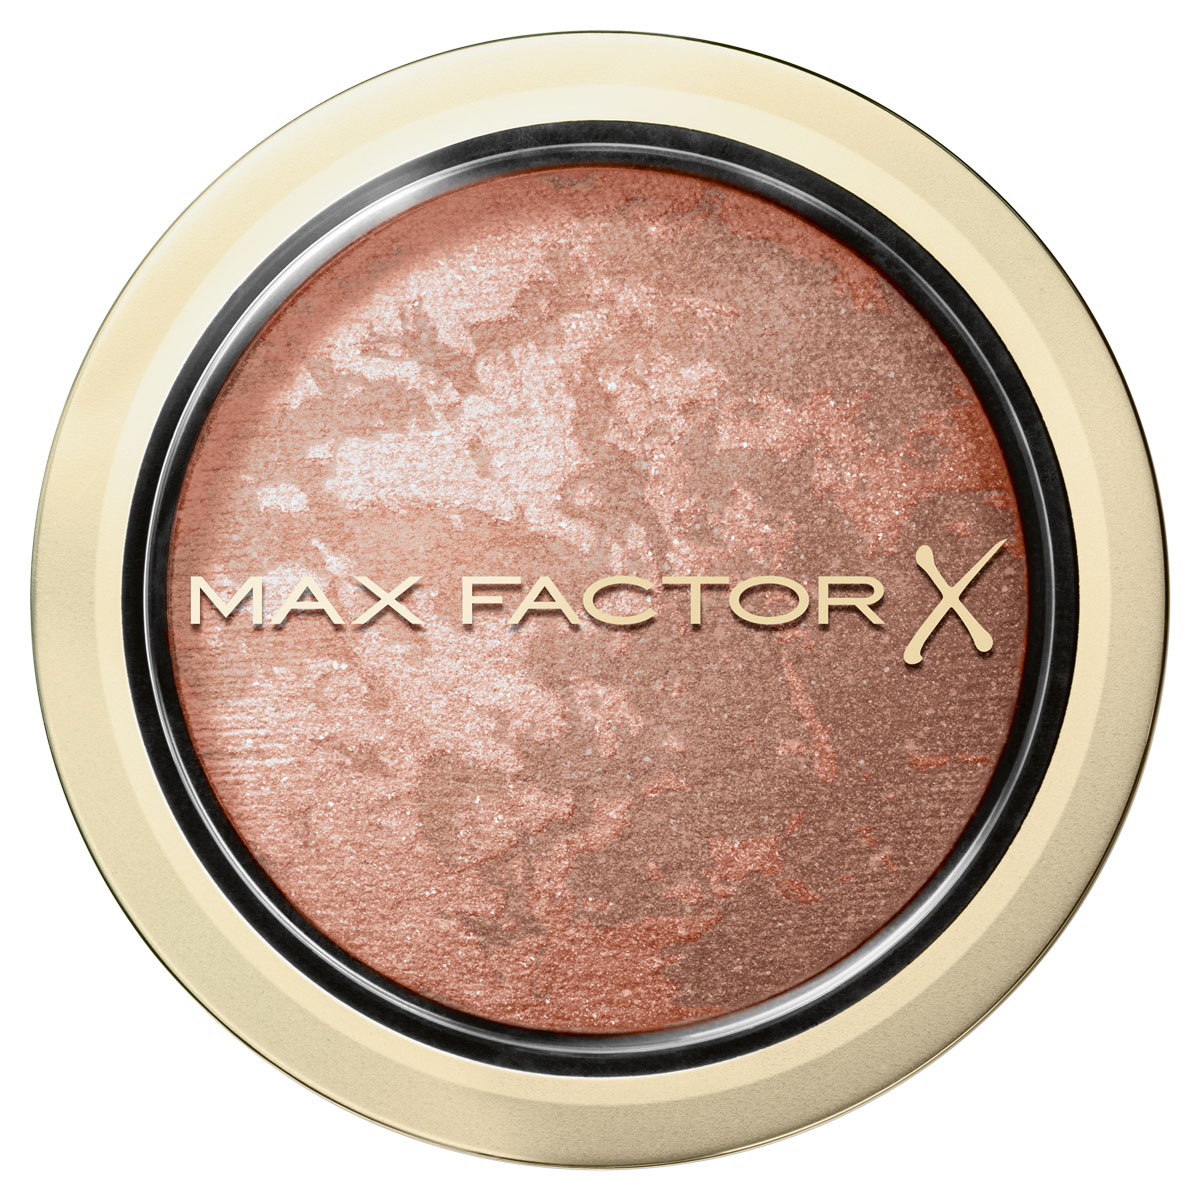 Max Factor Румяна Creme Puff Blush, тон 25 Alluring Rose max factor flawless perfection blush